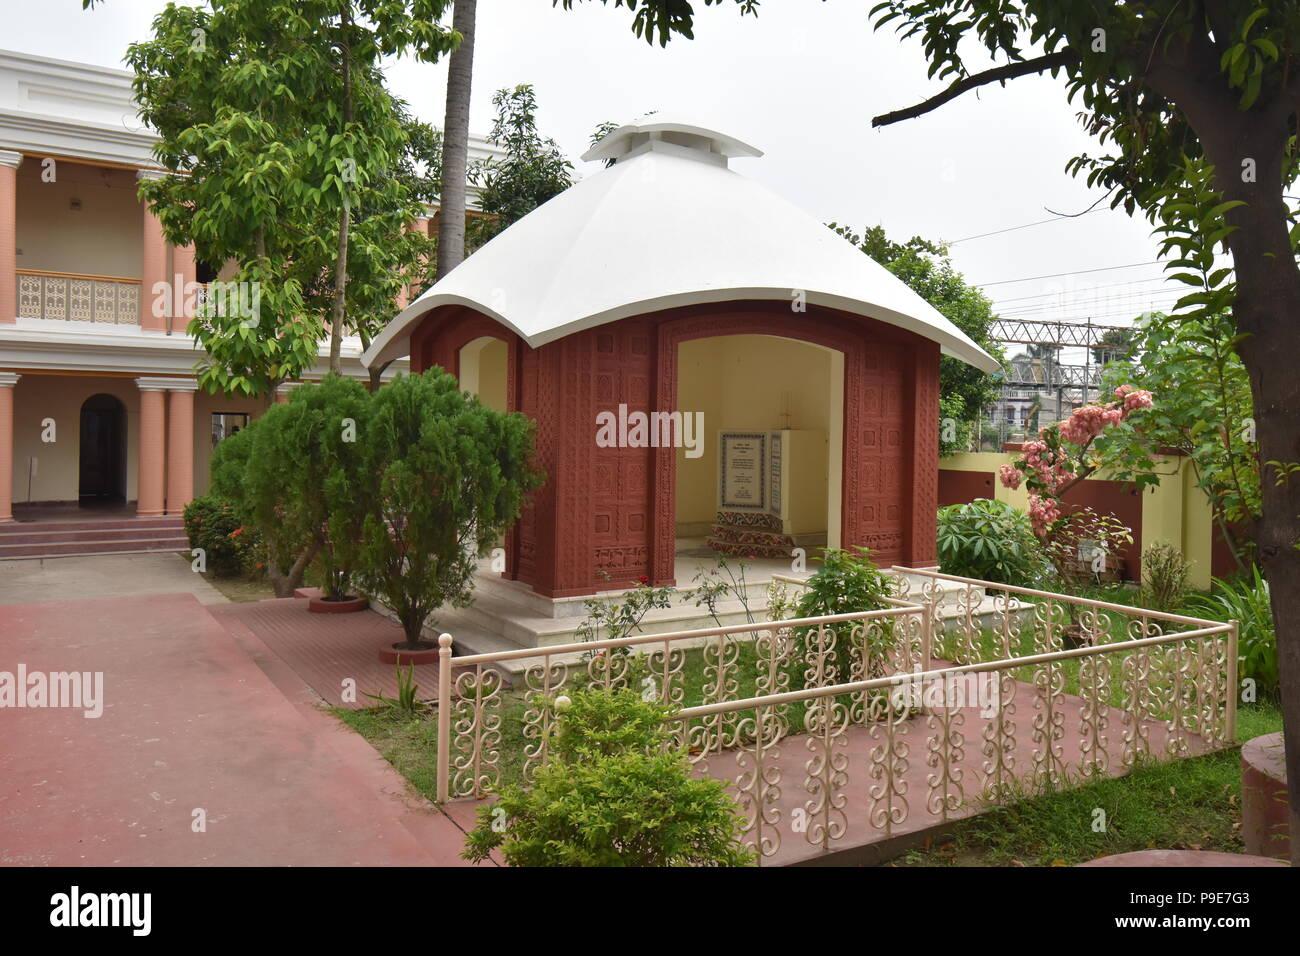 Birthplace of Bankim Chandra Chatterjee at Naihati, North 24 Parganas, West Bengal, India - Stock Image